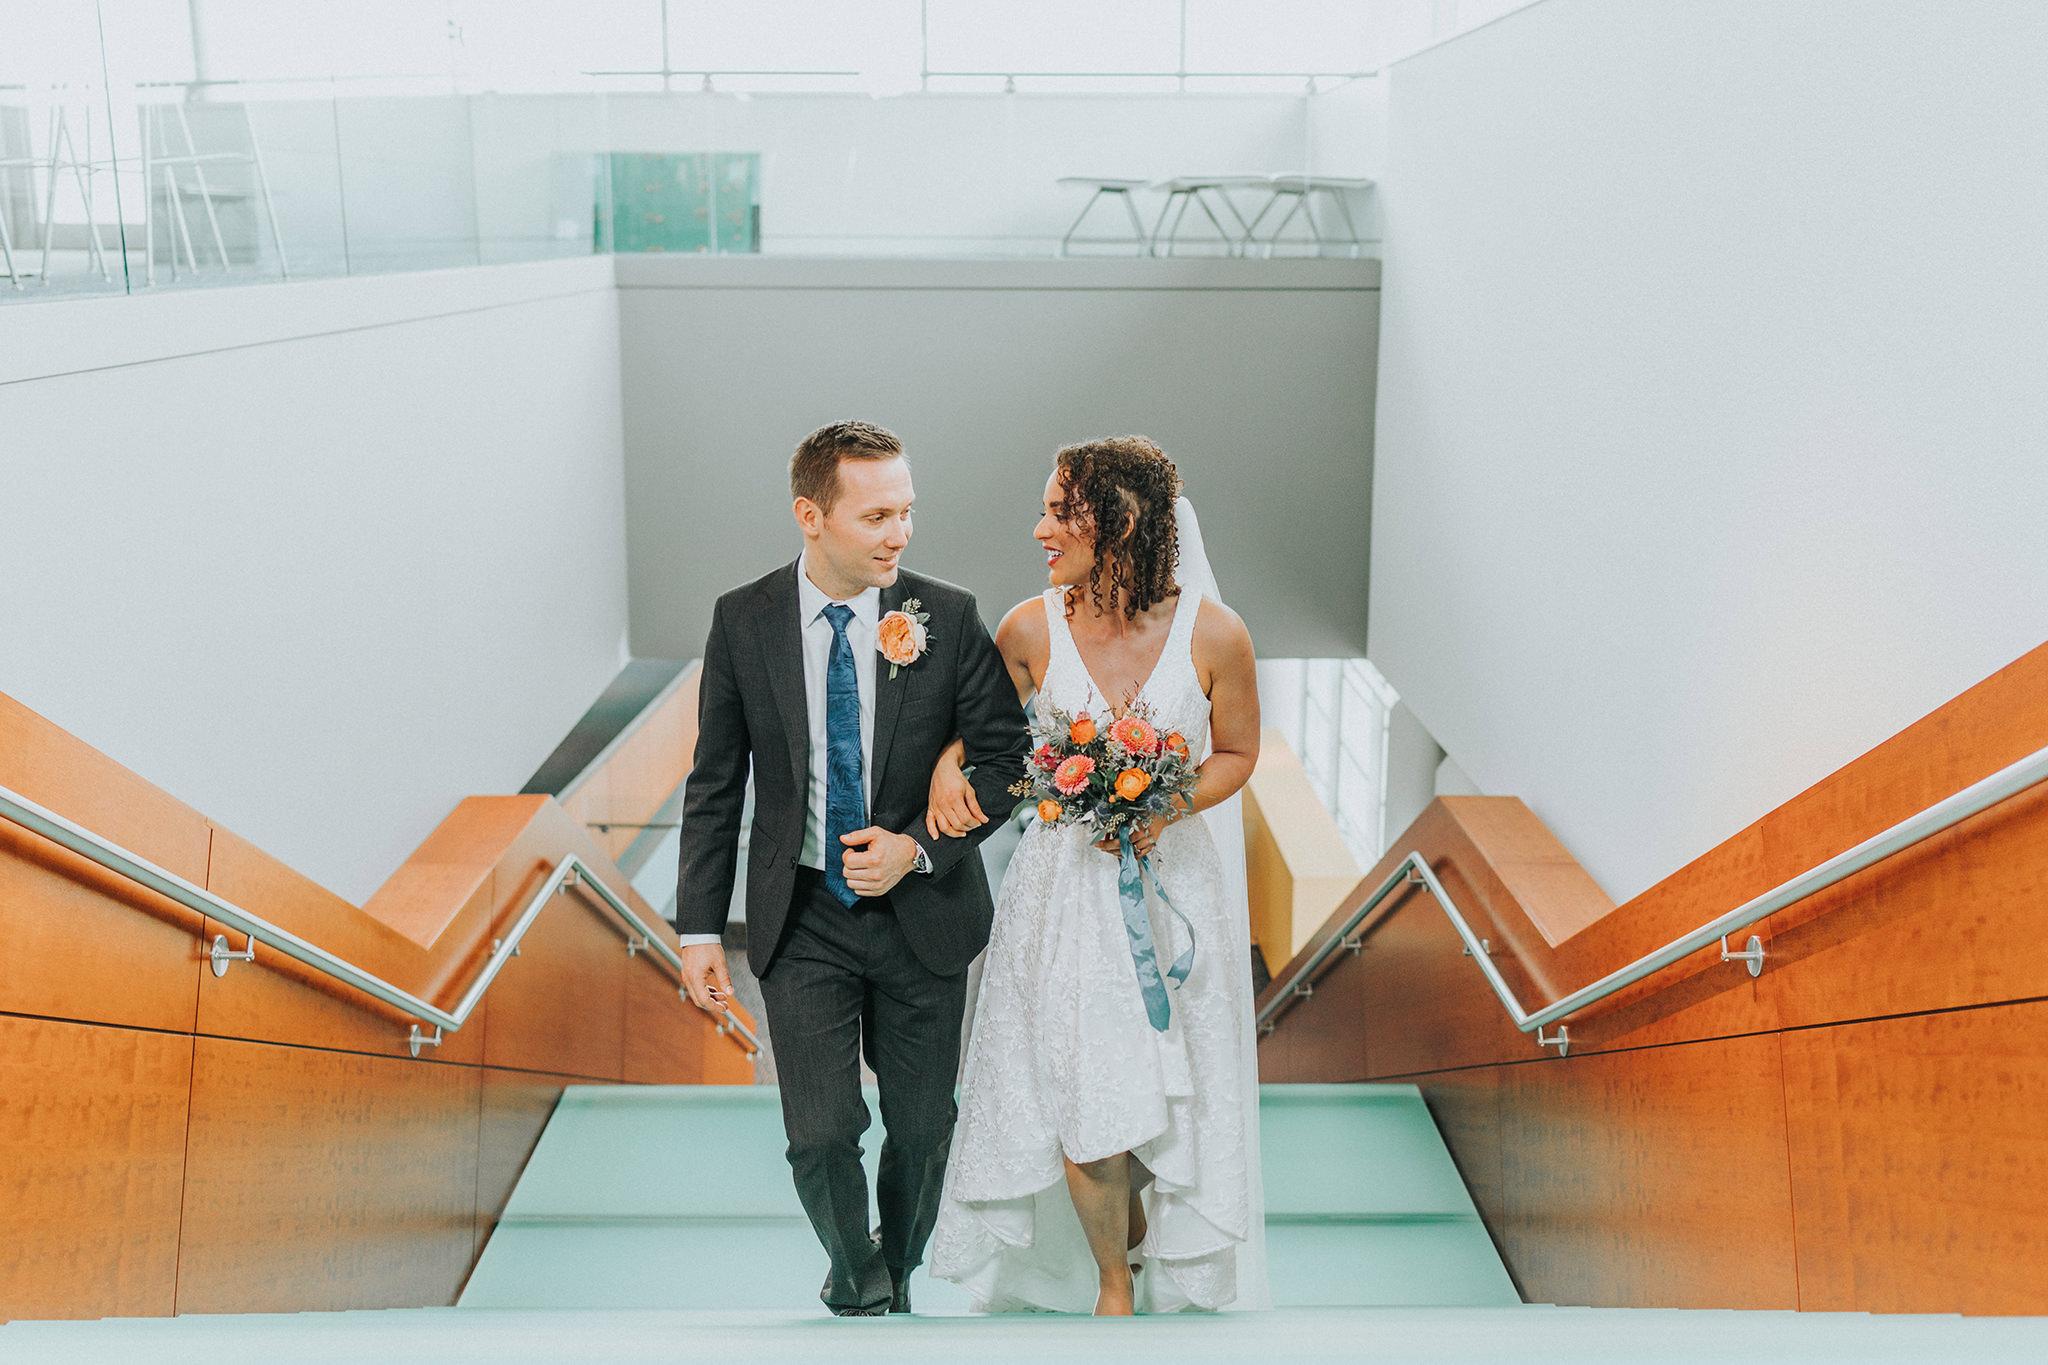 158 omaha-wedding-photographer-planner-tiny-luxe-velvet-sage.jpg